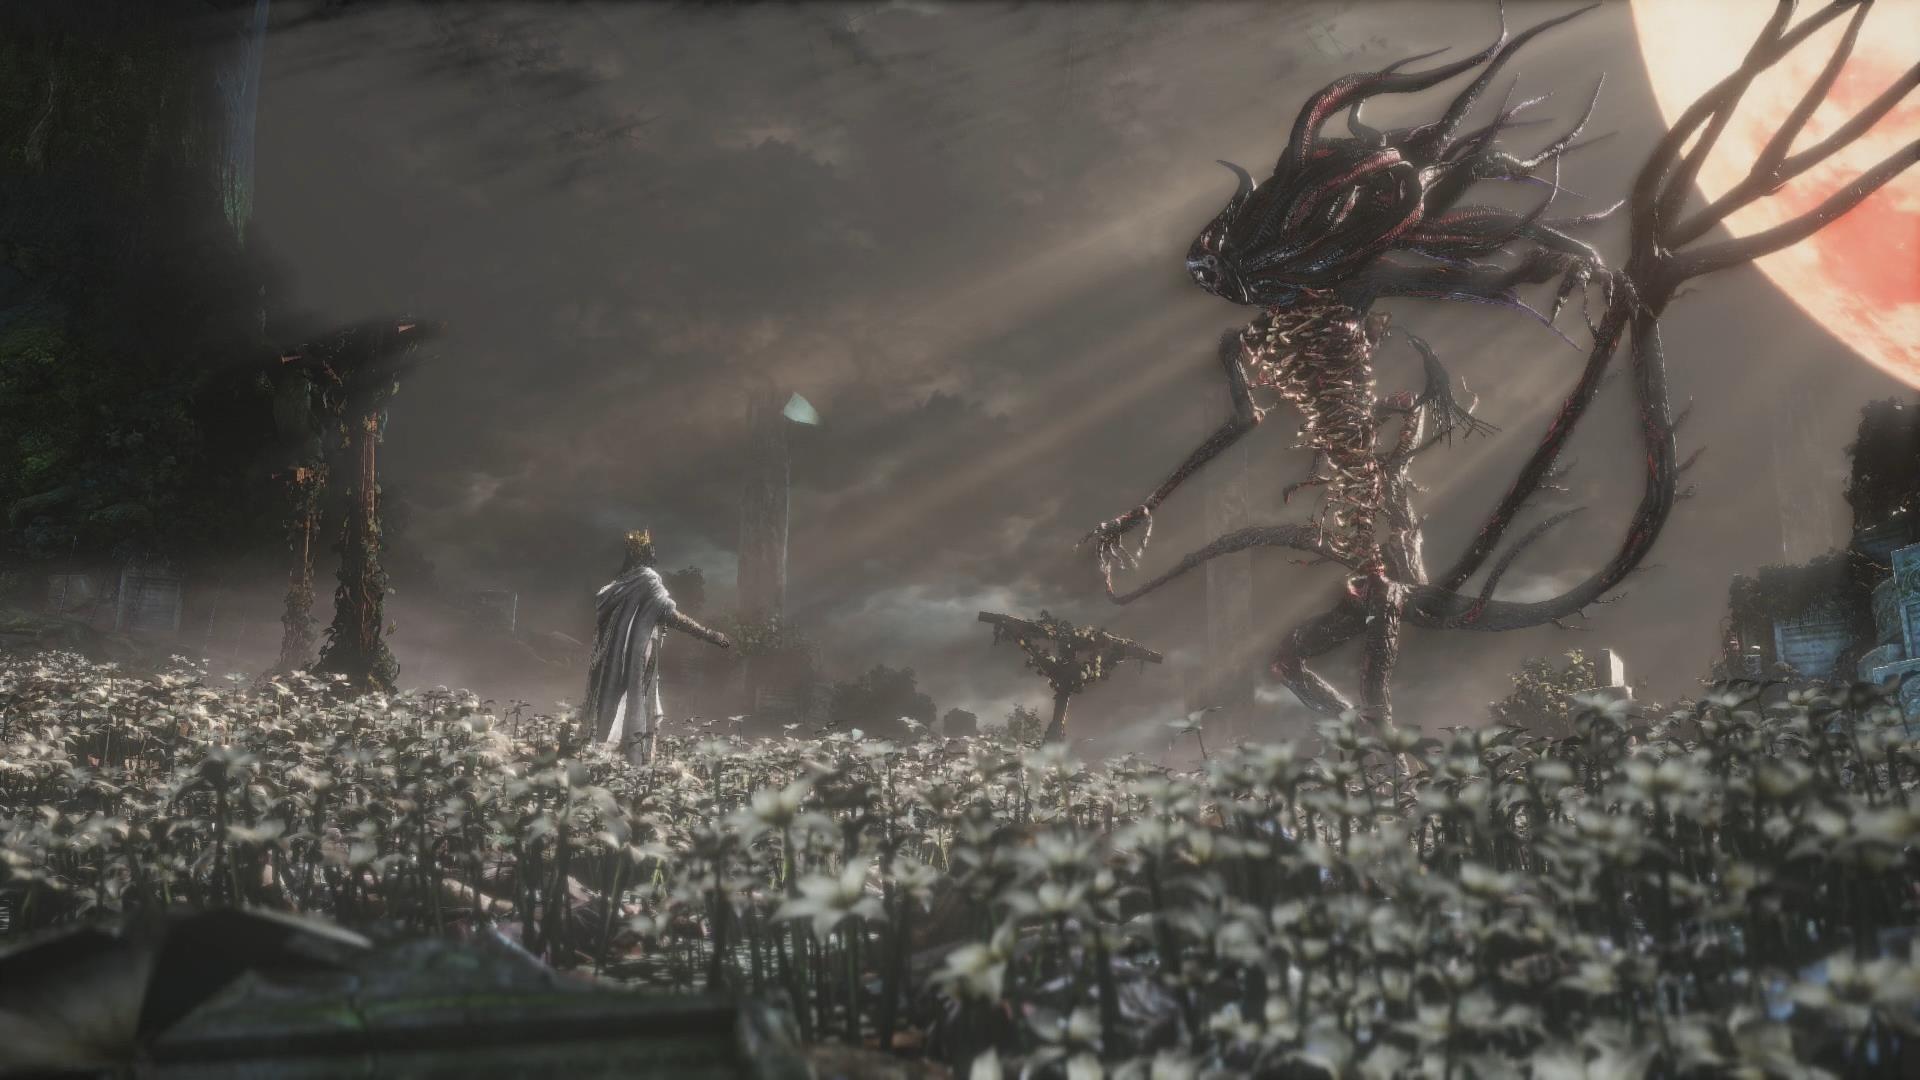 Dark Souls Animated Wallpaper Moon Presence Best Vidya Games Bloodborne Old Blood